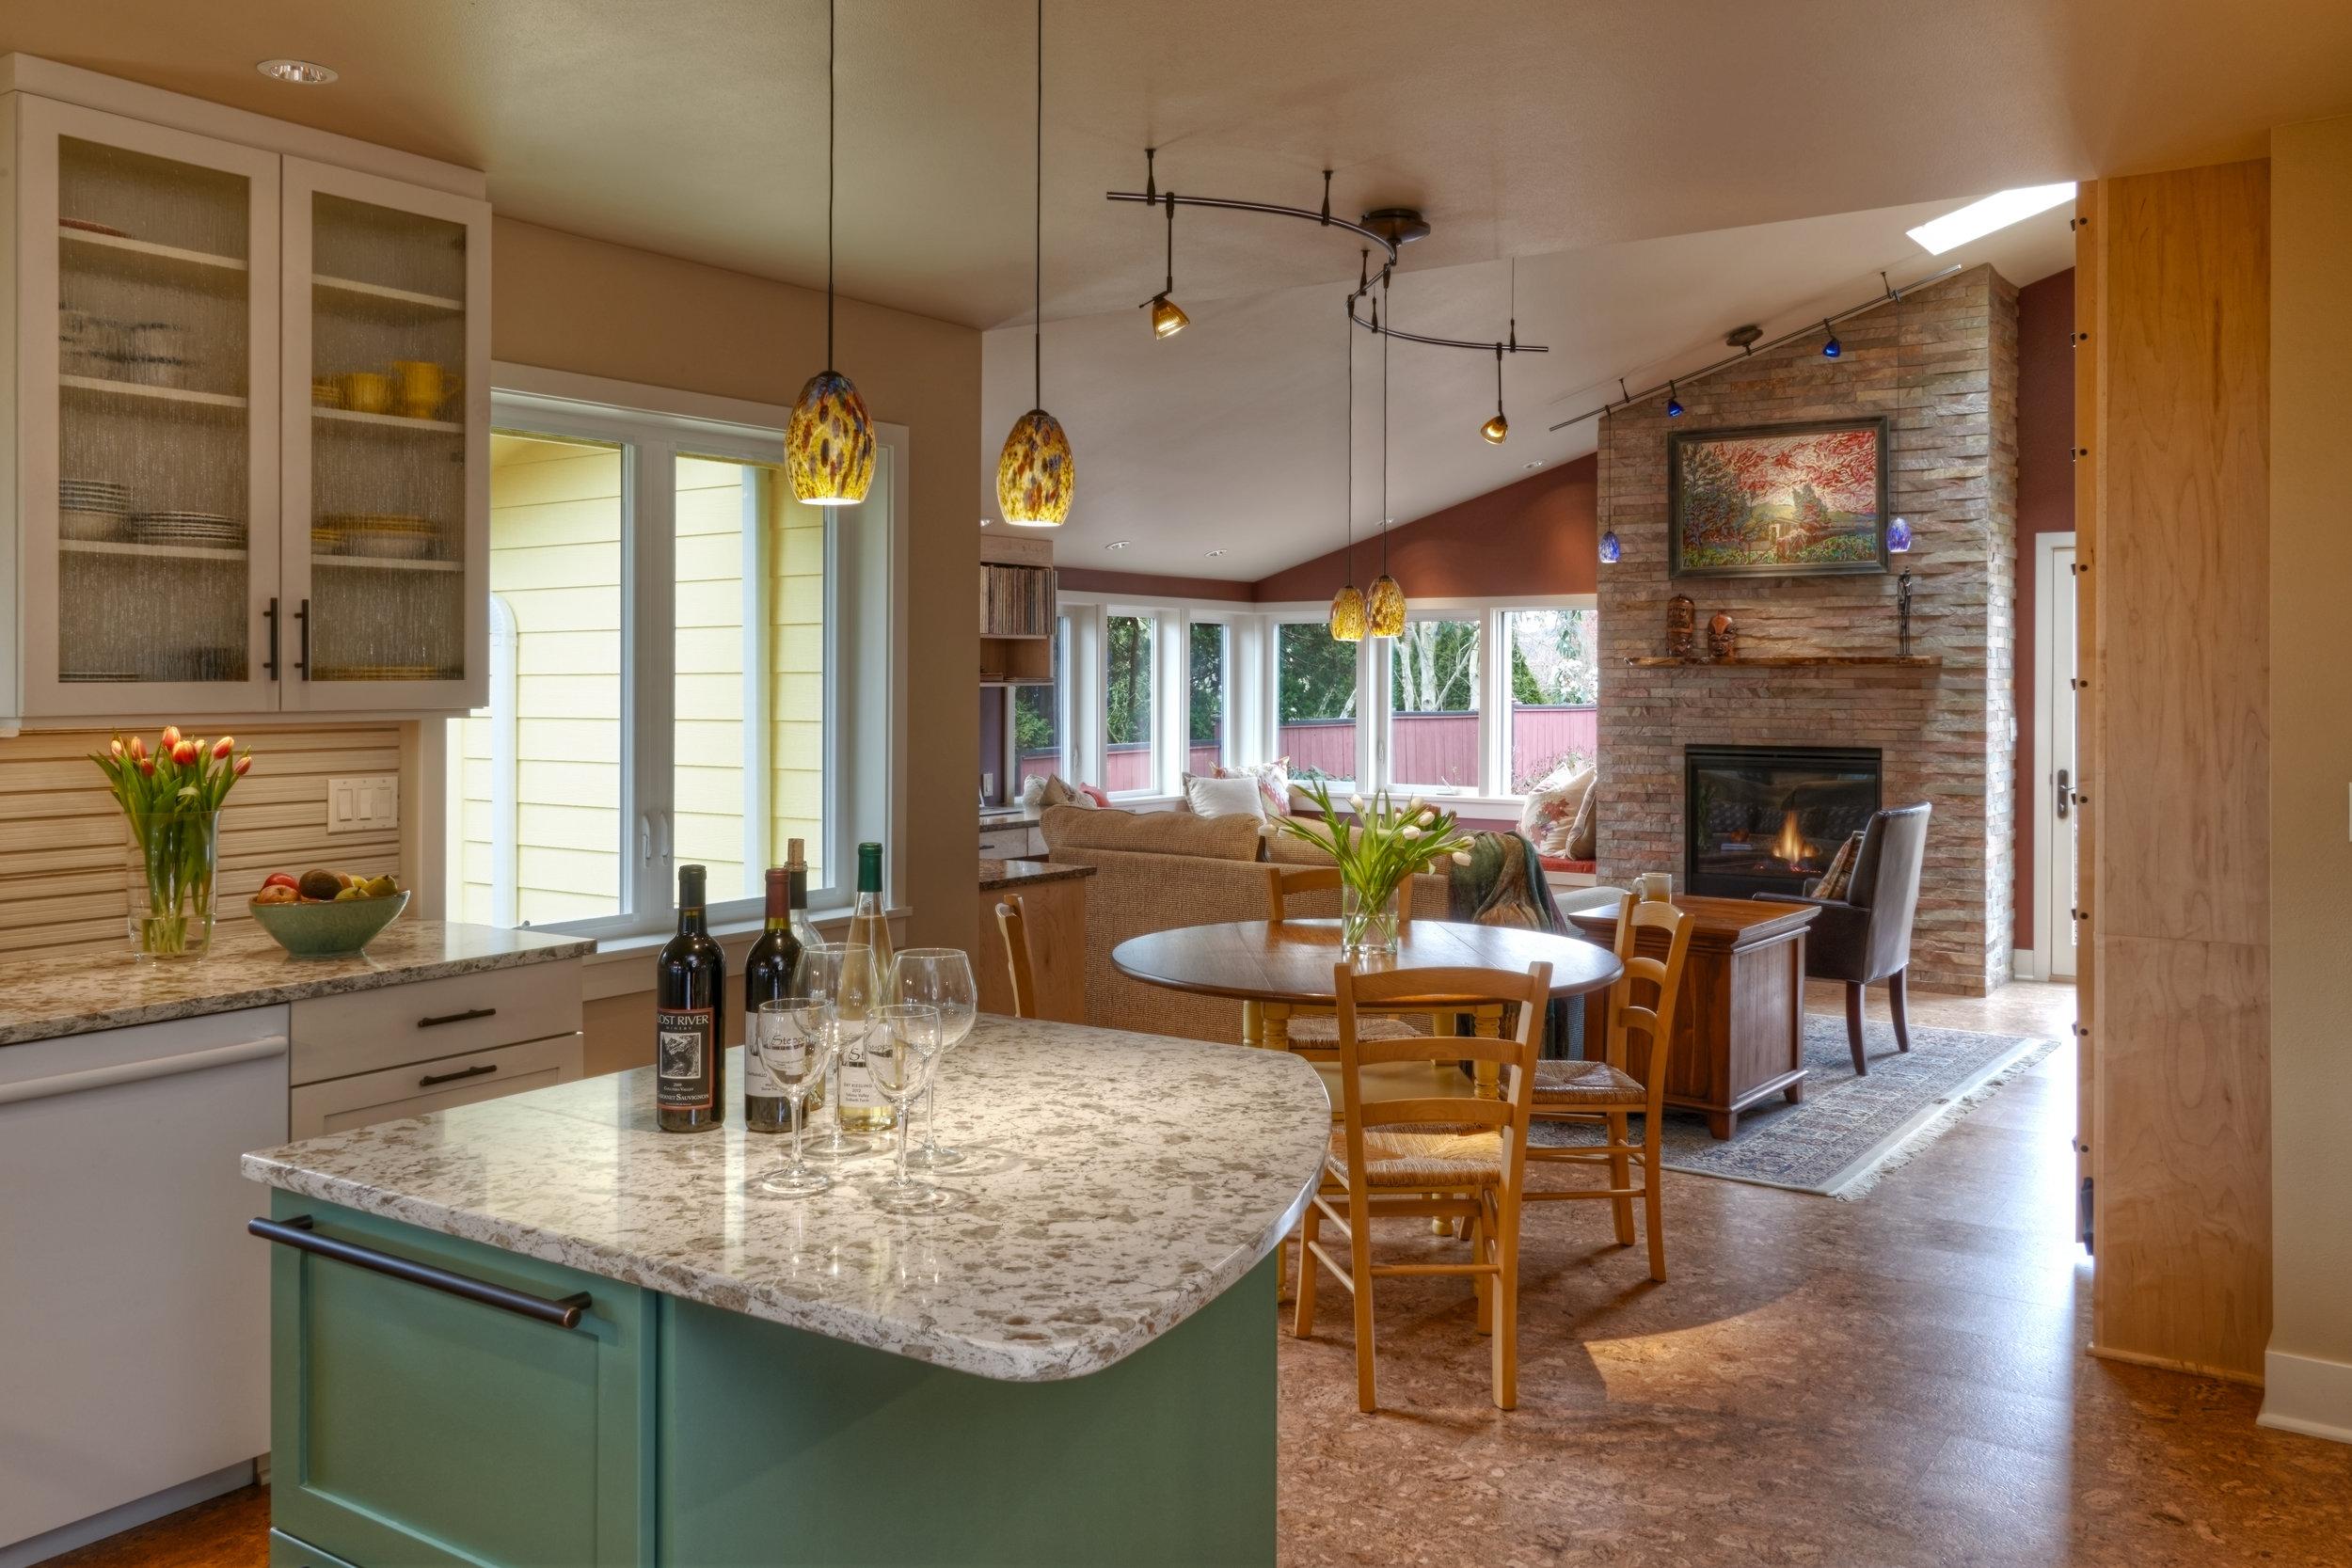 laurie Robbins - kitchen dining.jpg